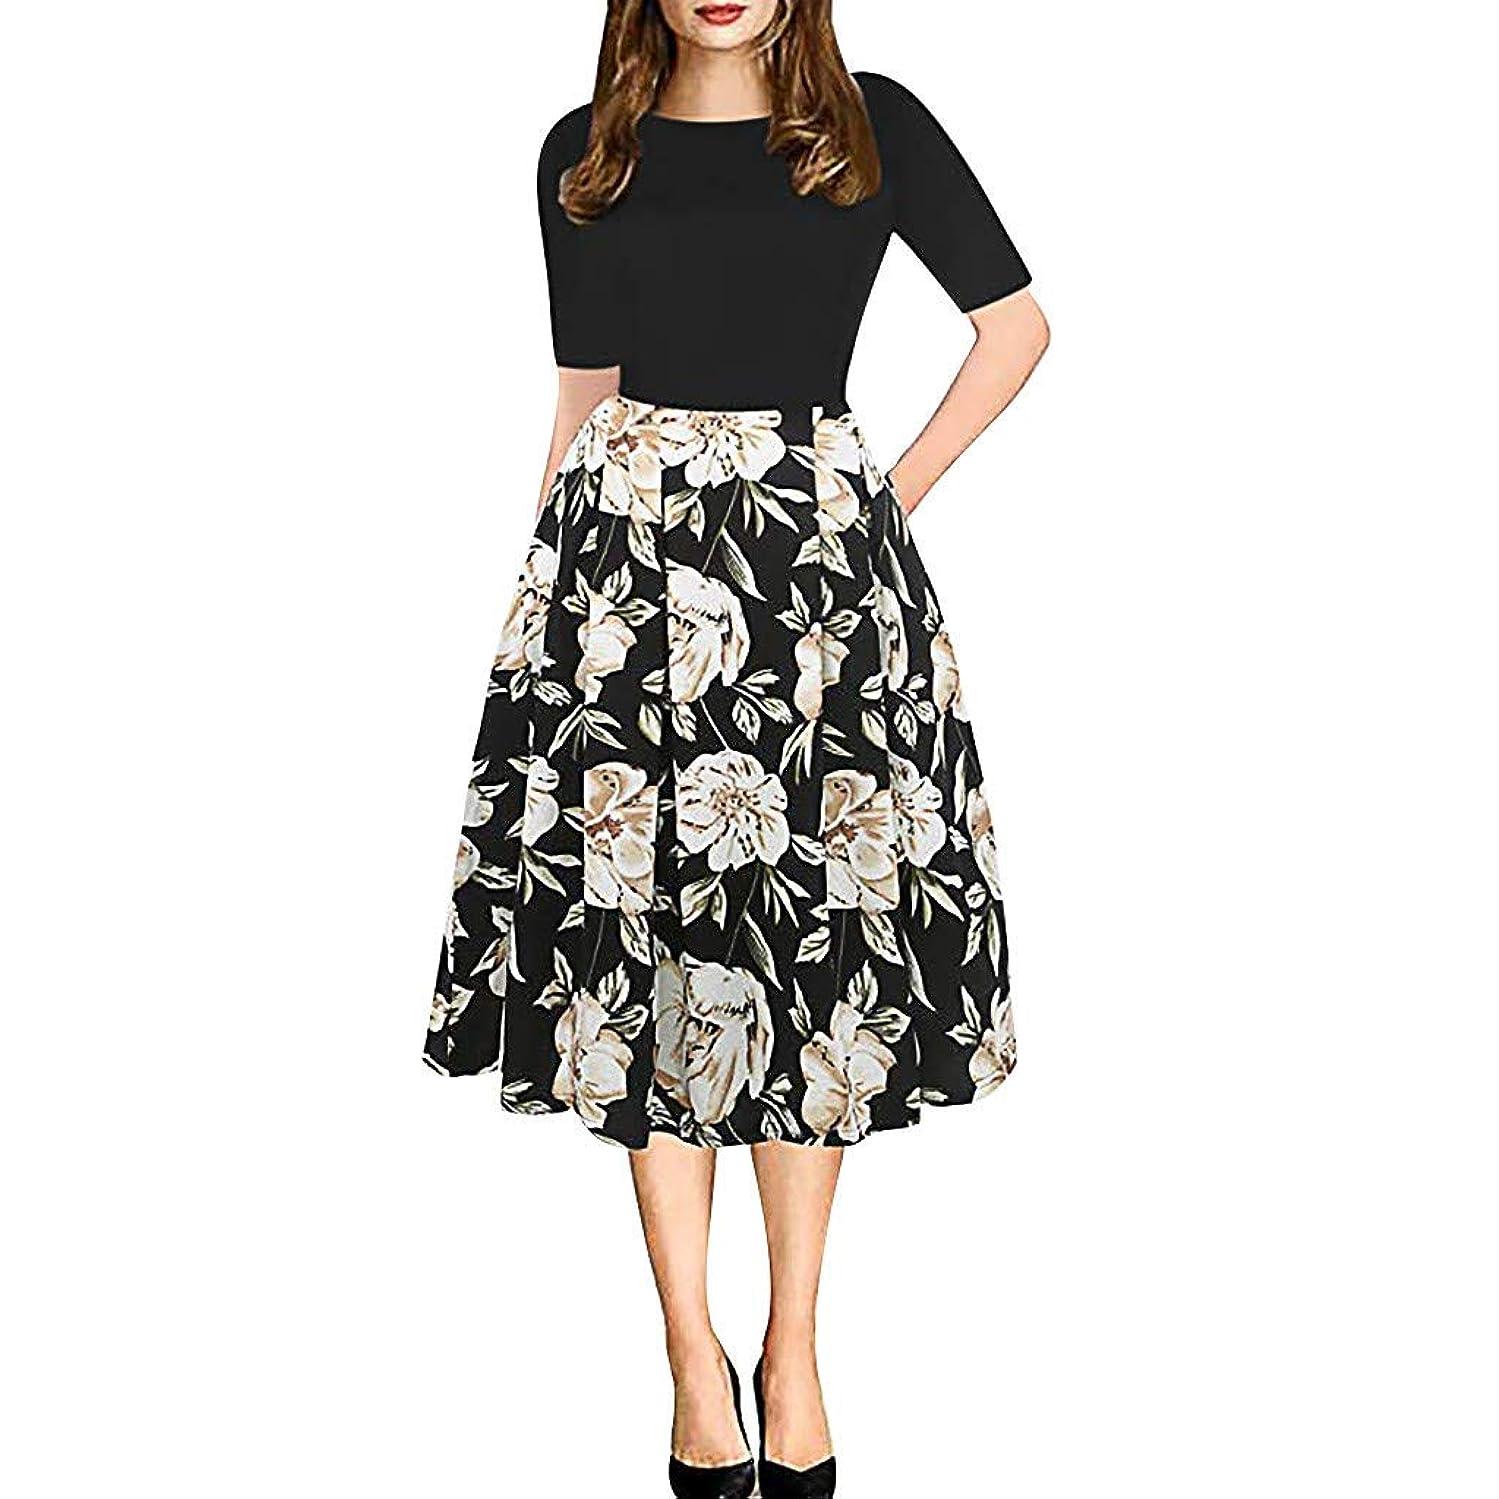 NANTE Top Women Casual Dress Vintage Patchwork Pockets Long Dresses Puffy Swing Print Length Sundress Party Evening Skirt